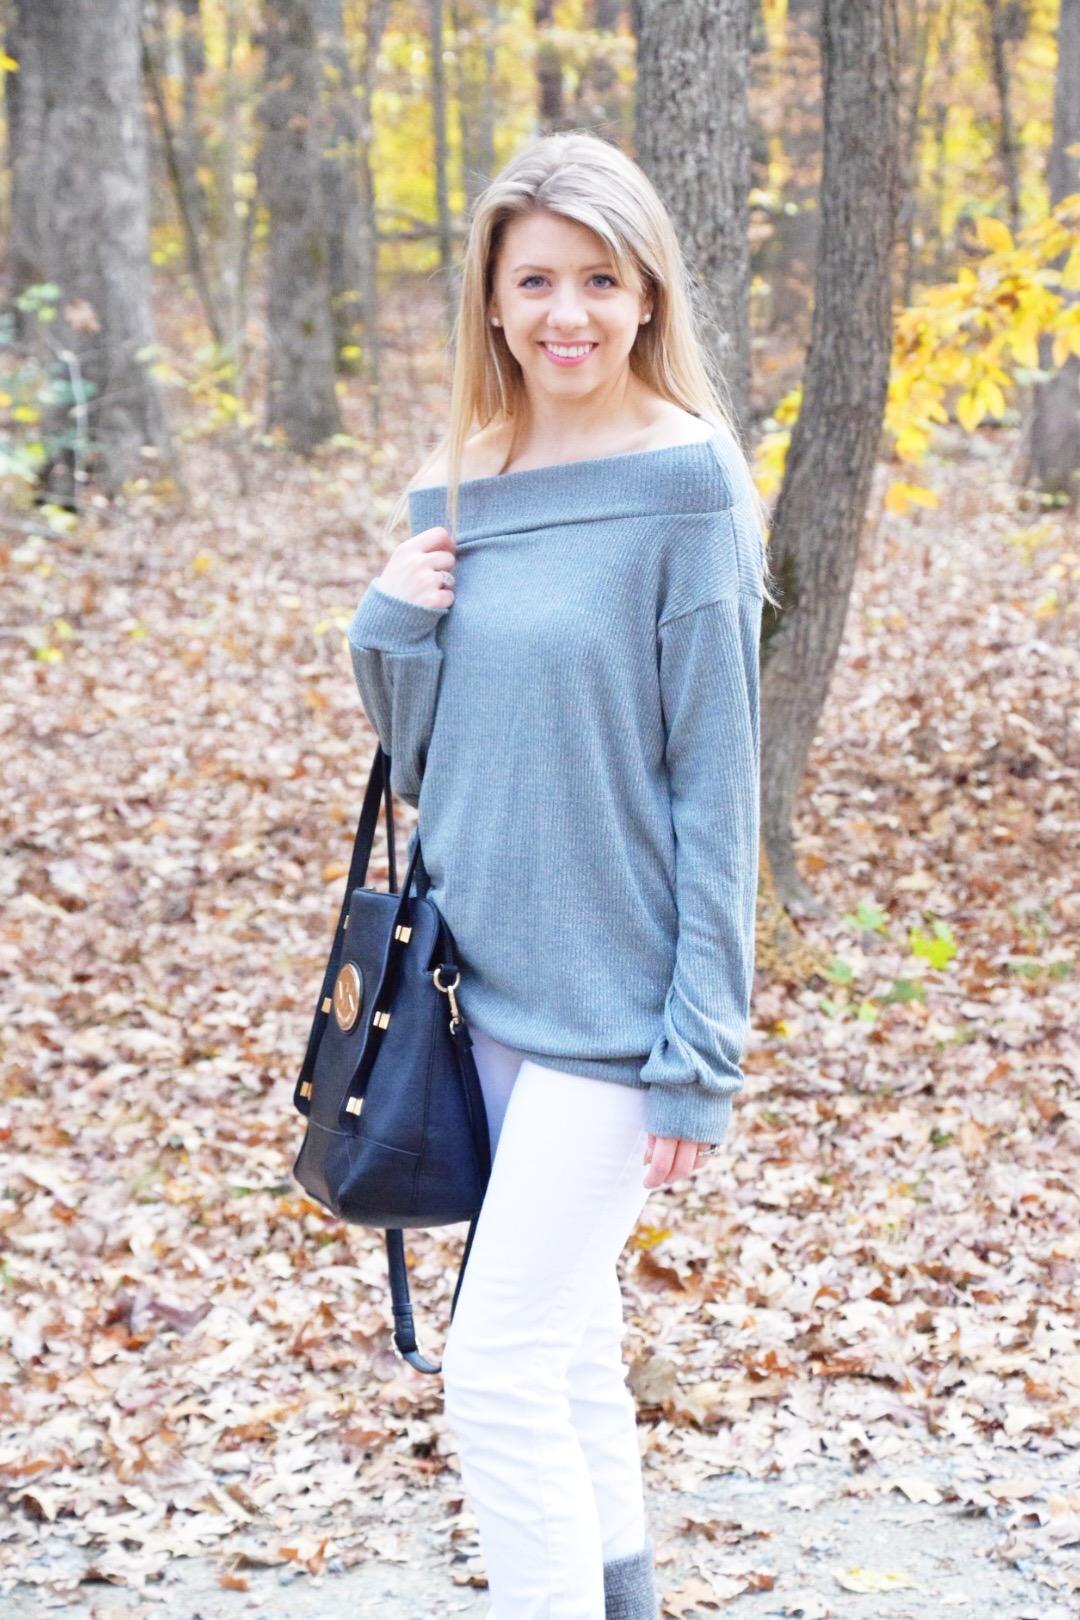 Off the Shoulder Look - Wander Dust Blog - Houston Lifestyle Blogger (7).JPG